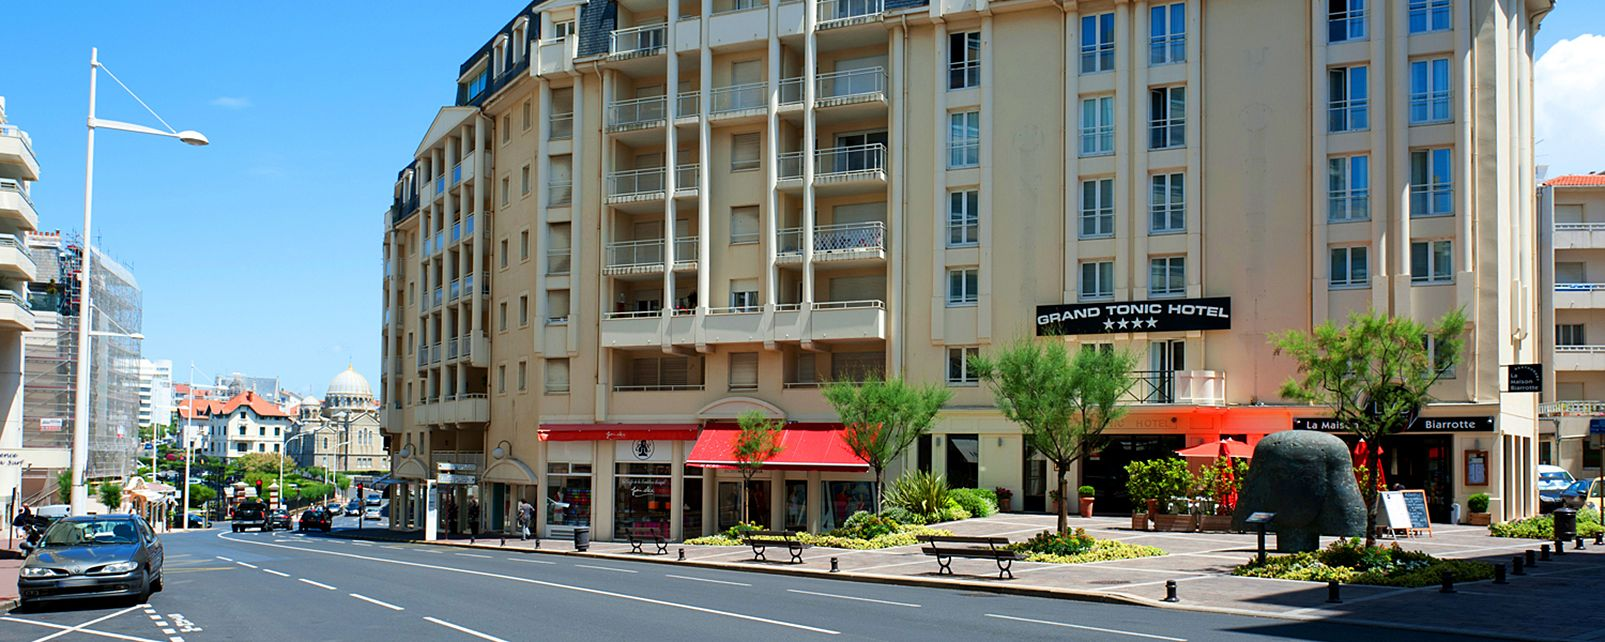 Hôtel Grand Tonic Hôtel Biarritz